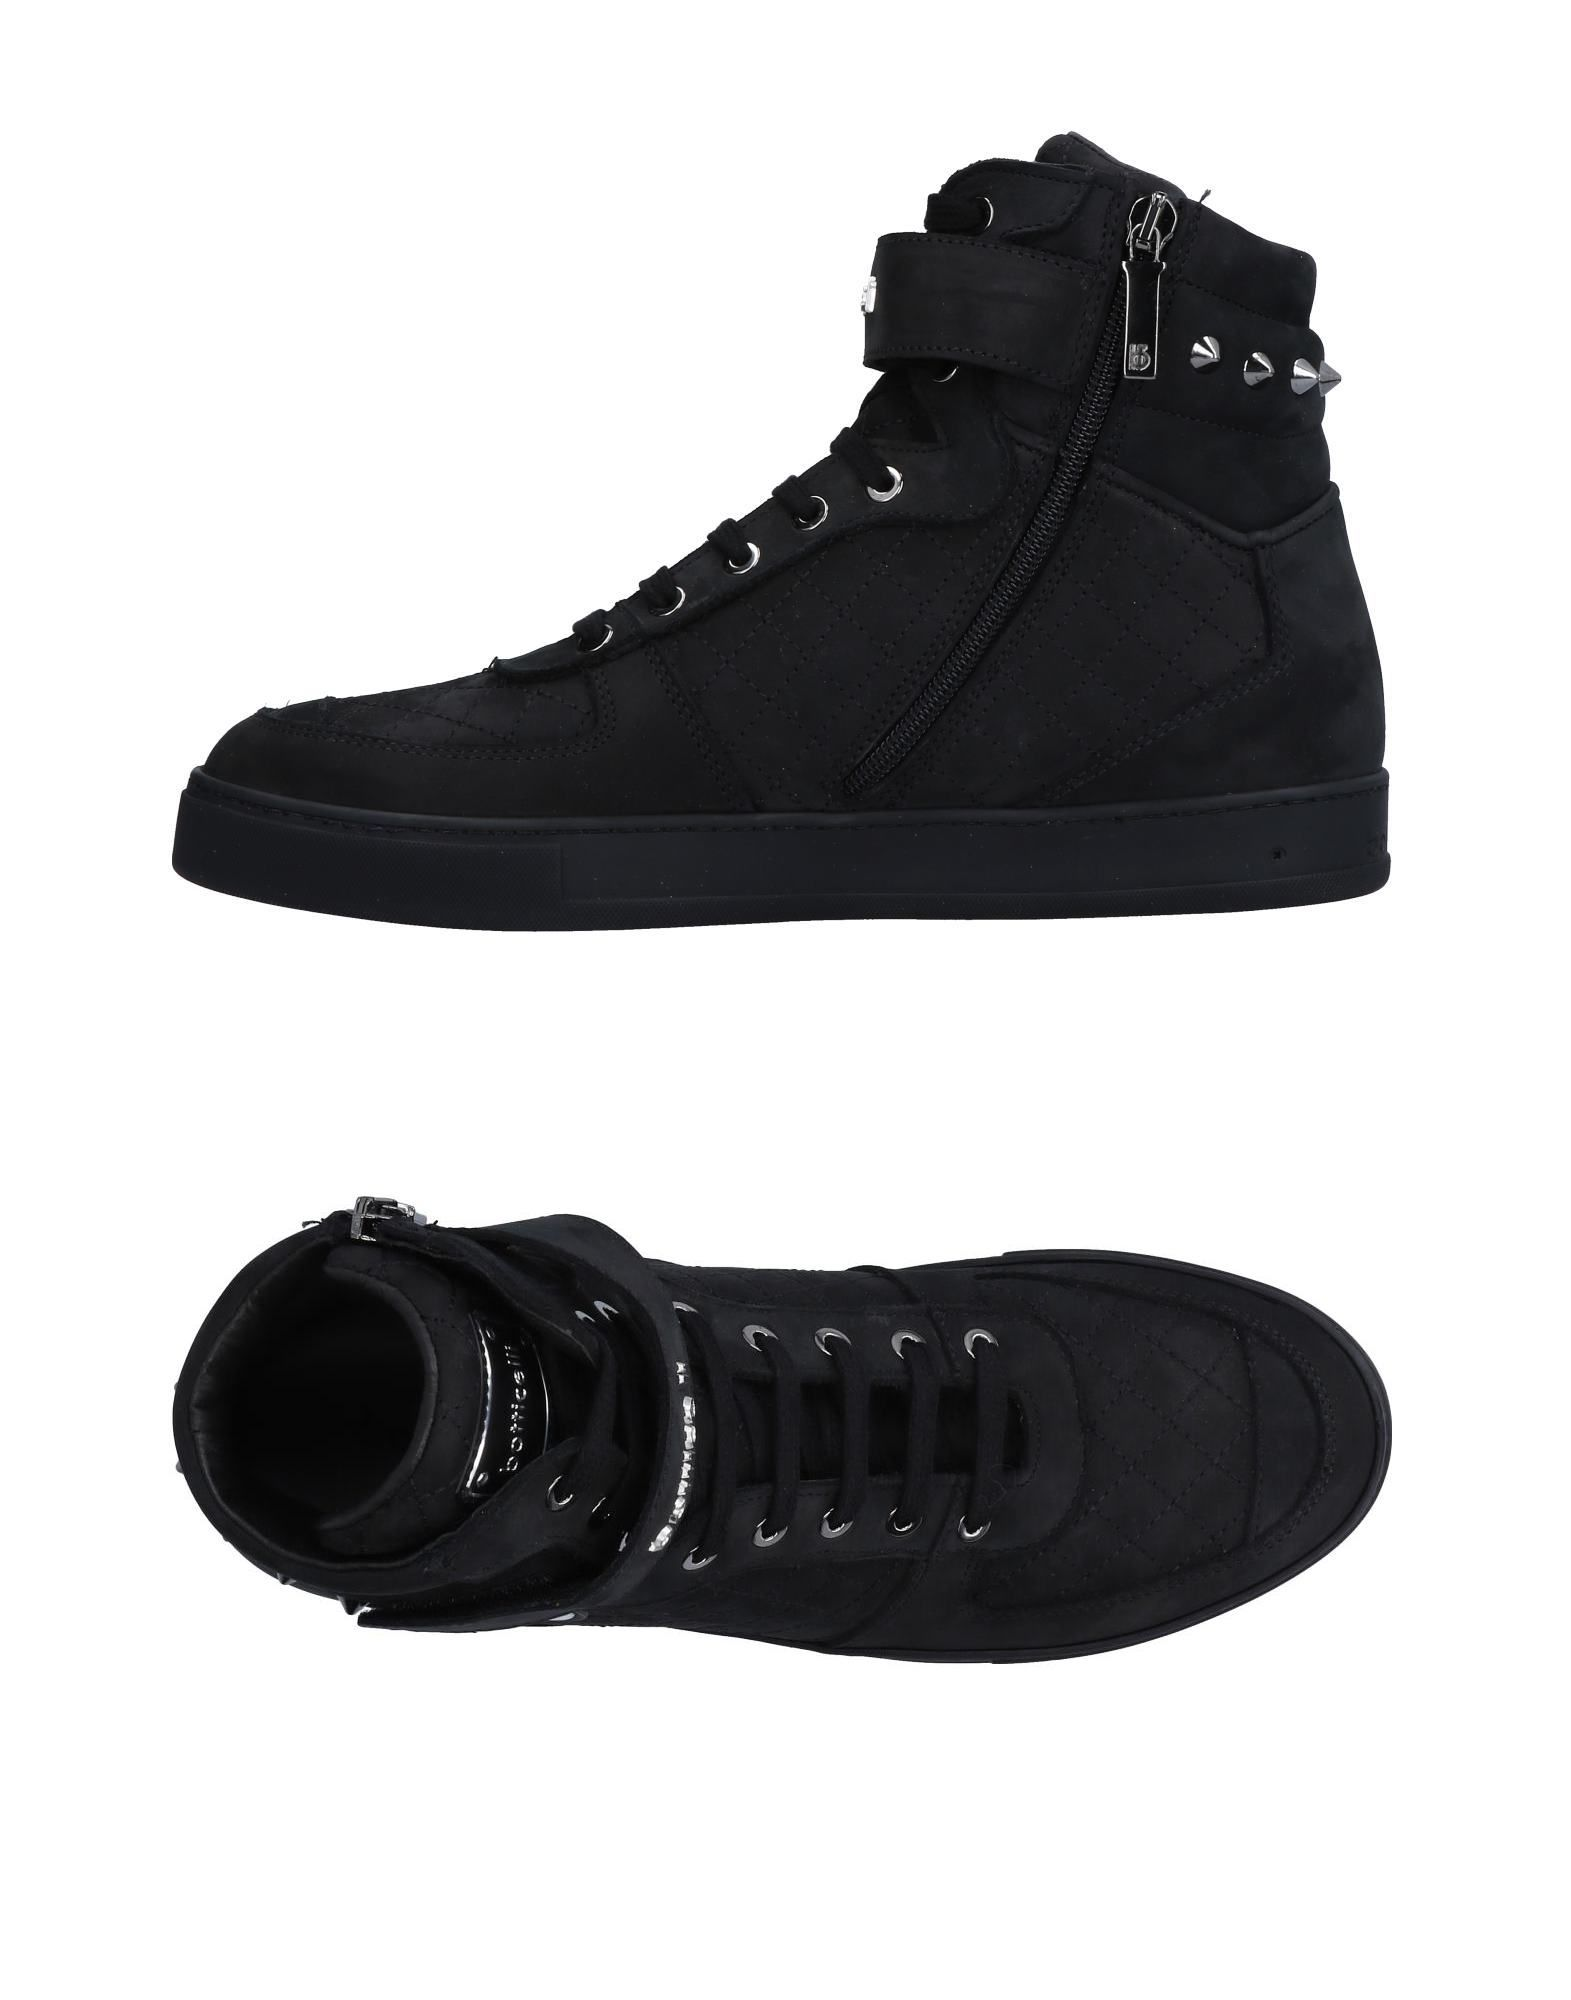 Roberto Botticelli Herren Sneakers Herren Botticelli  11515685KR Gute Qualität beliebte Schuhe 7ebf48